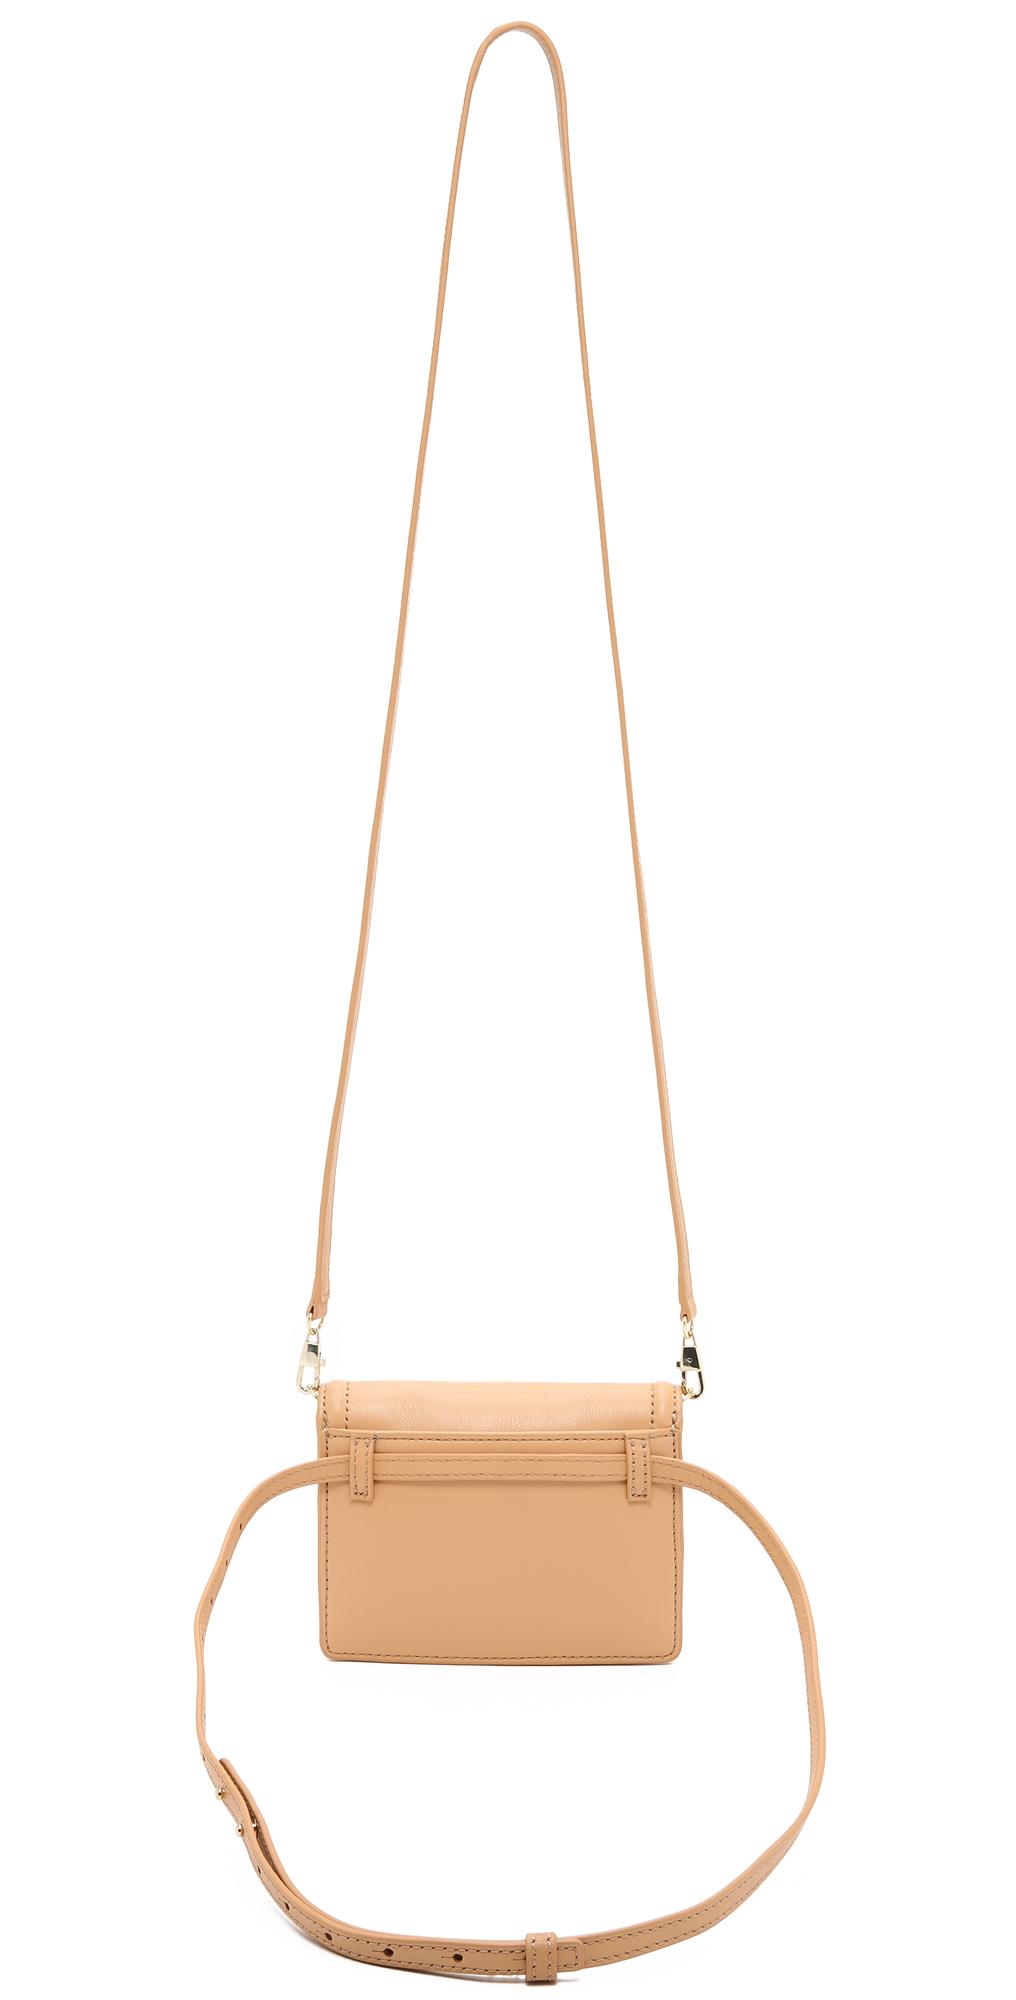 LOEFFLER RANDALL Baby Rider Waist Pack Natural//Golden One Size